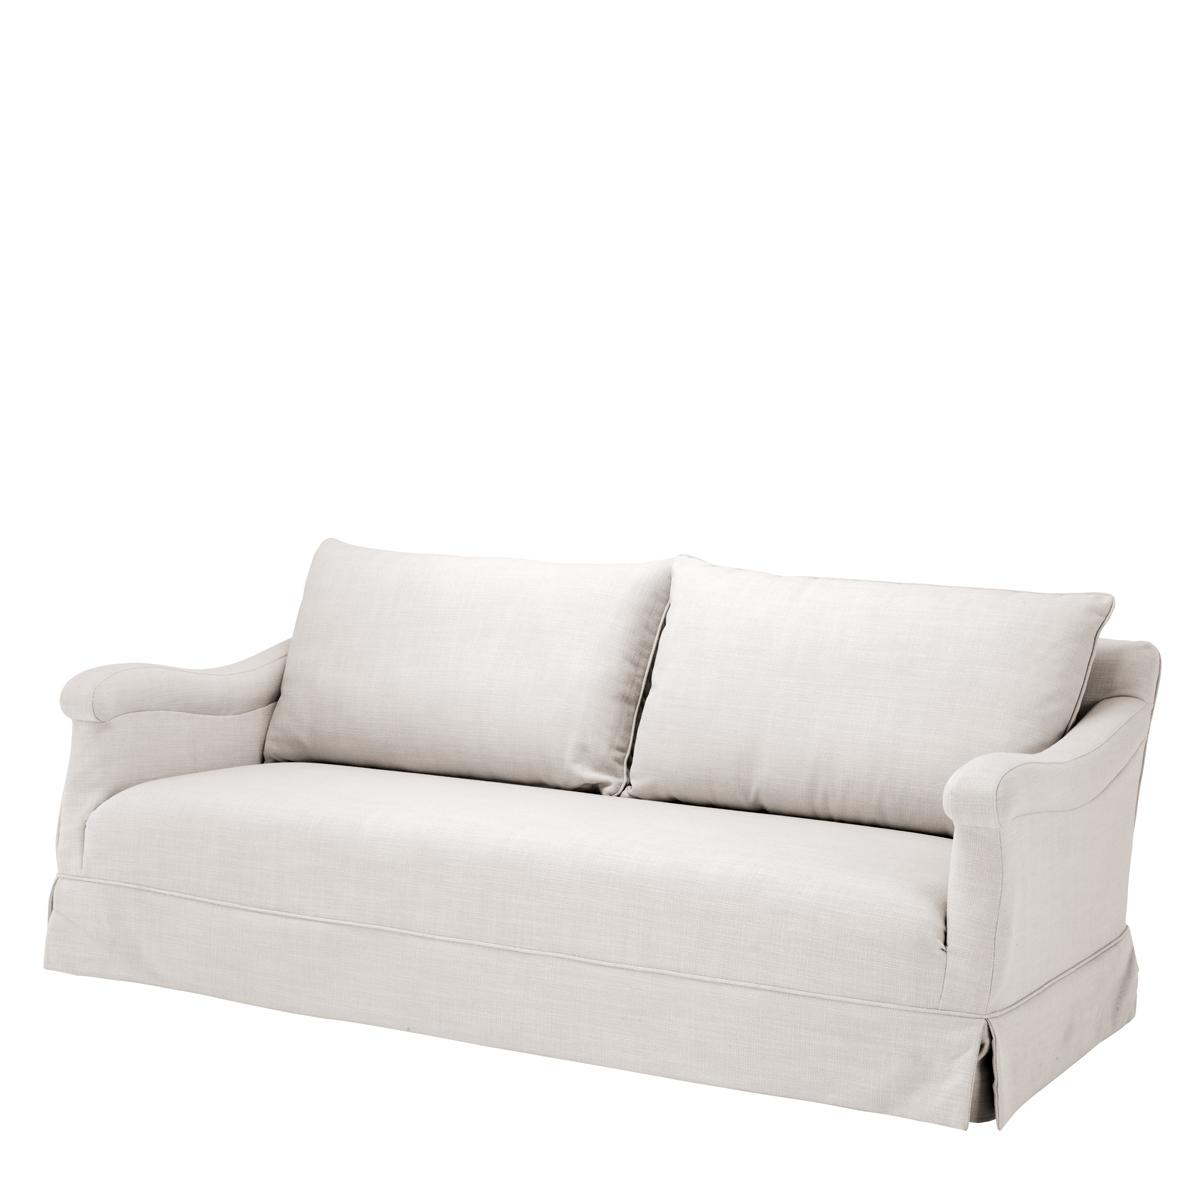 Sofa-Cedric-1